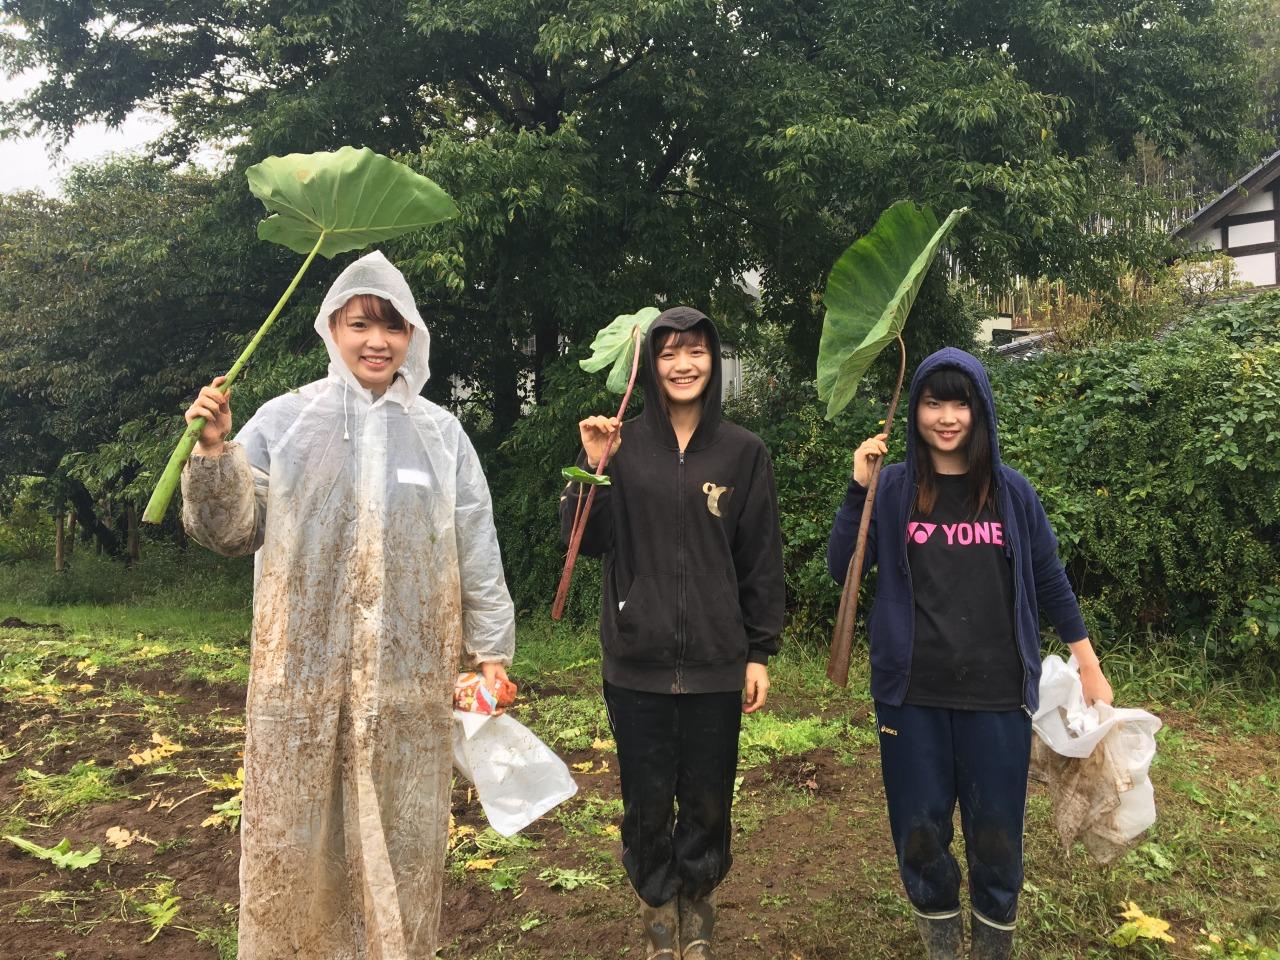 祓川ゼミ 小学生と農業体験④ 最終回 大雨の中収穫